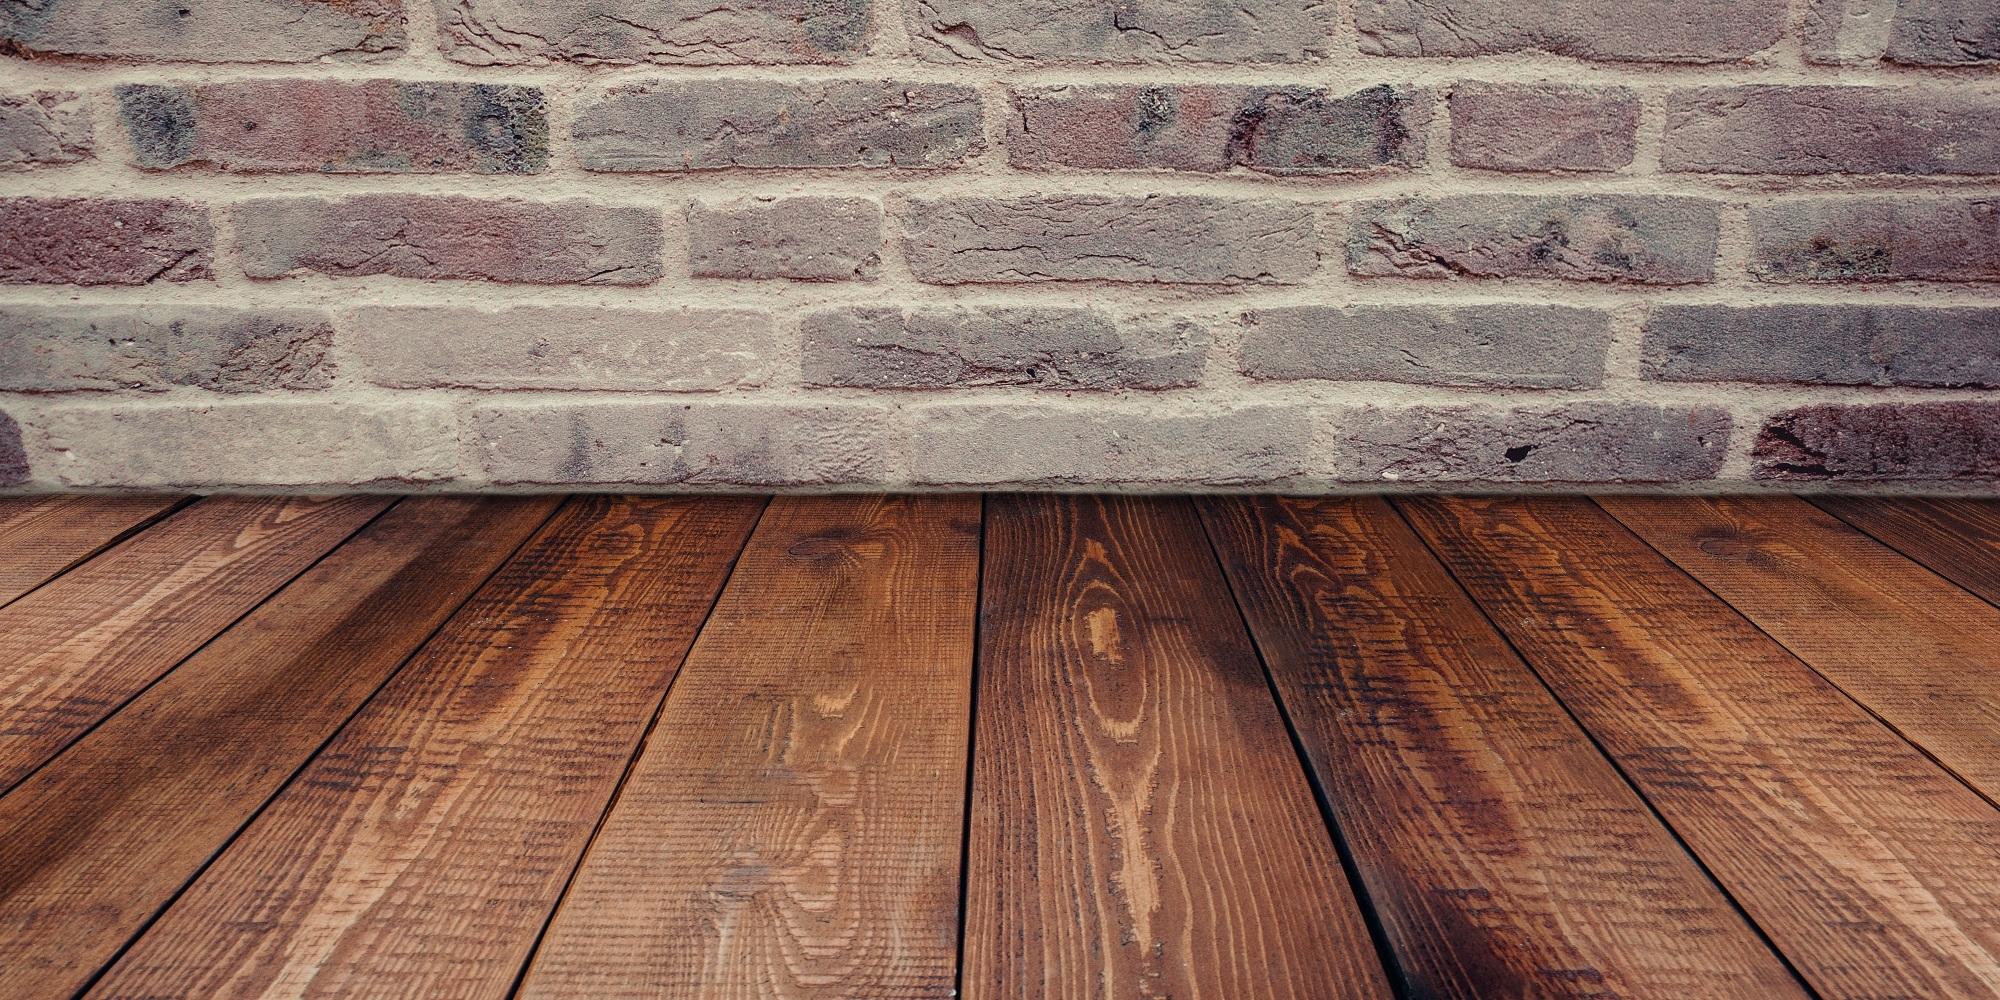 Free Images : Floor, Wall, Studio, Tile, Set, Room, Brick